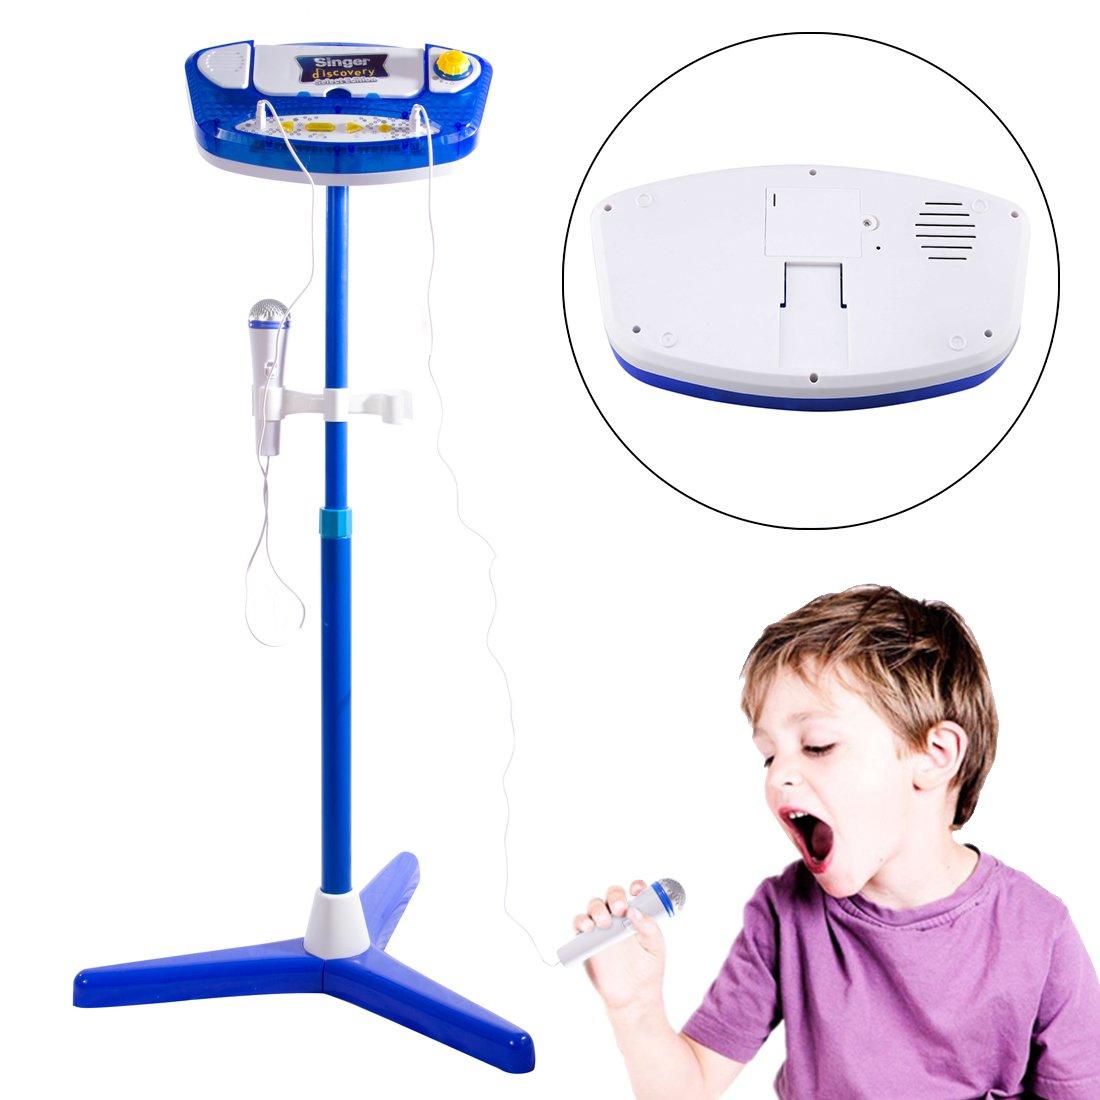 Foxom Karaoke Maschine, 45-97cm Verstellbar Kinder Bluetooth Karaoke Player with 2 Mikrofon Musik Spielzeug Karaoke Set